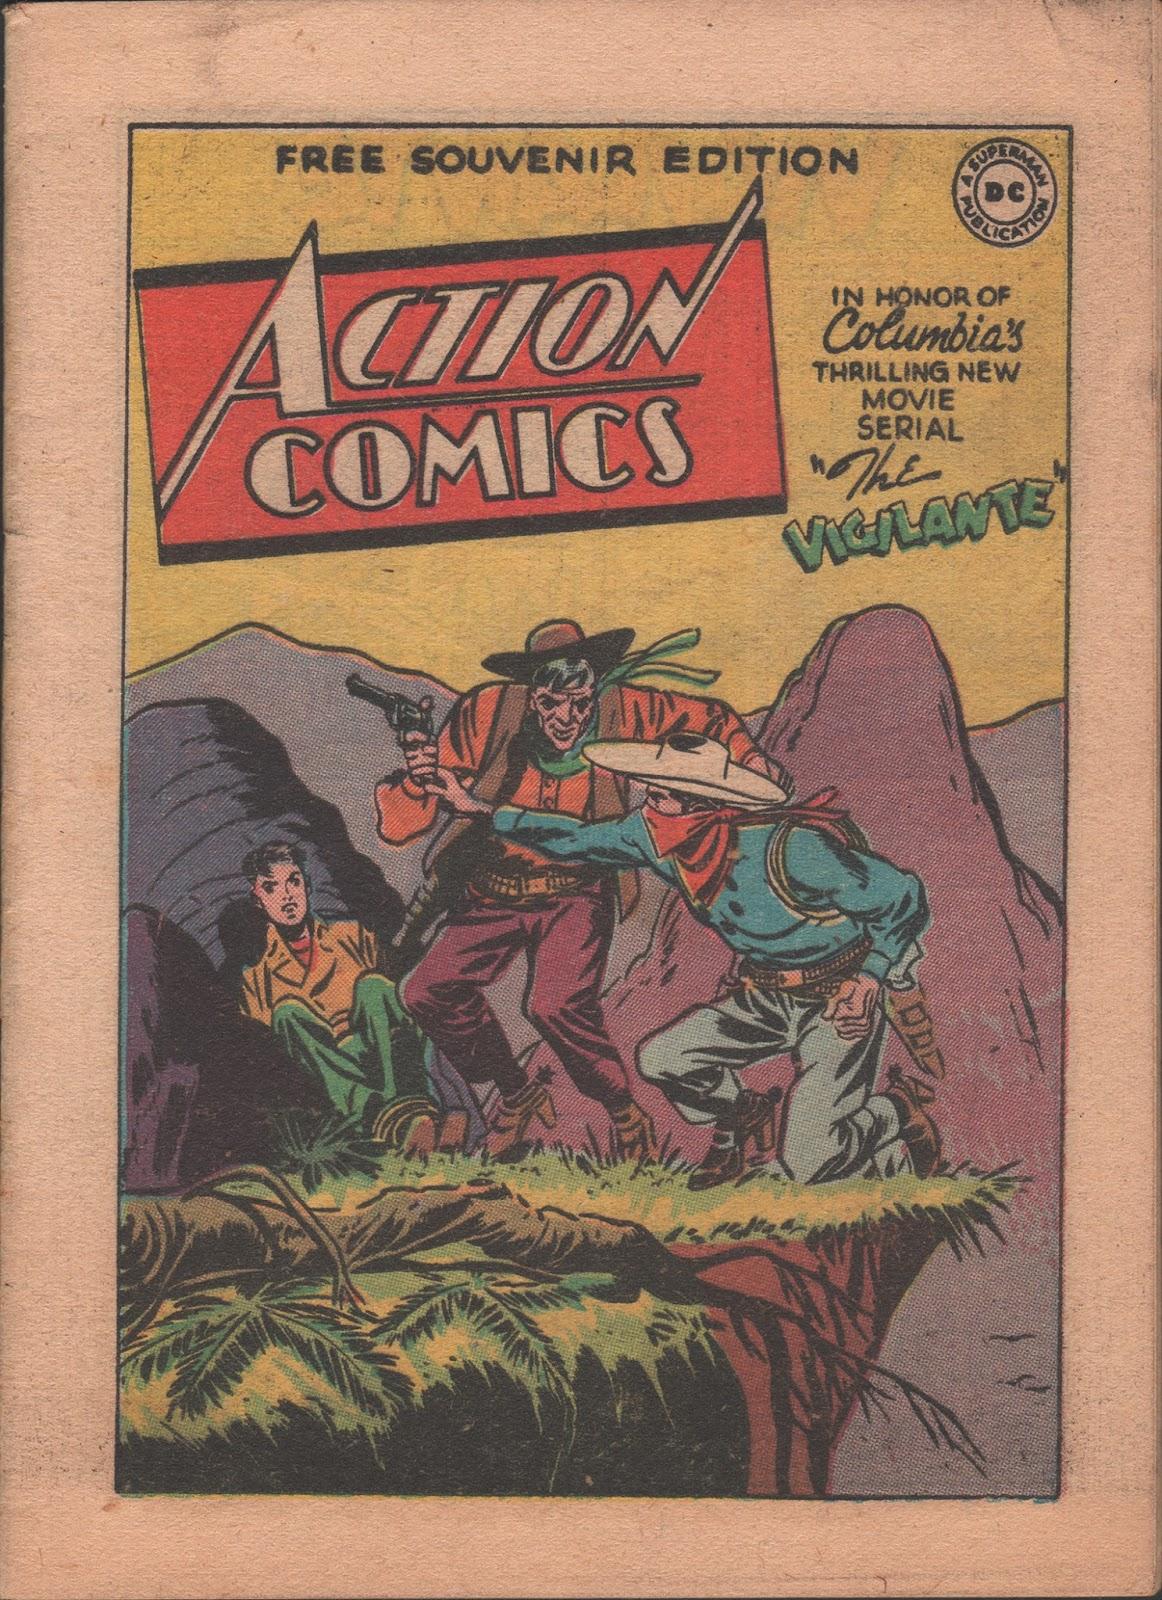 Action Comics (1947)